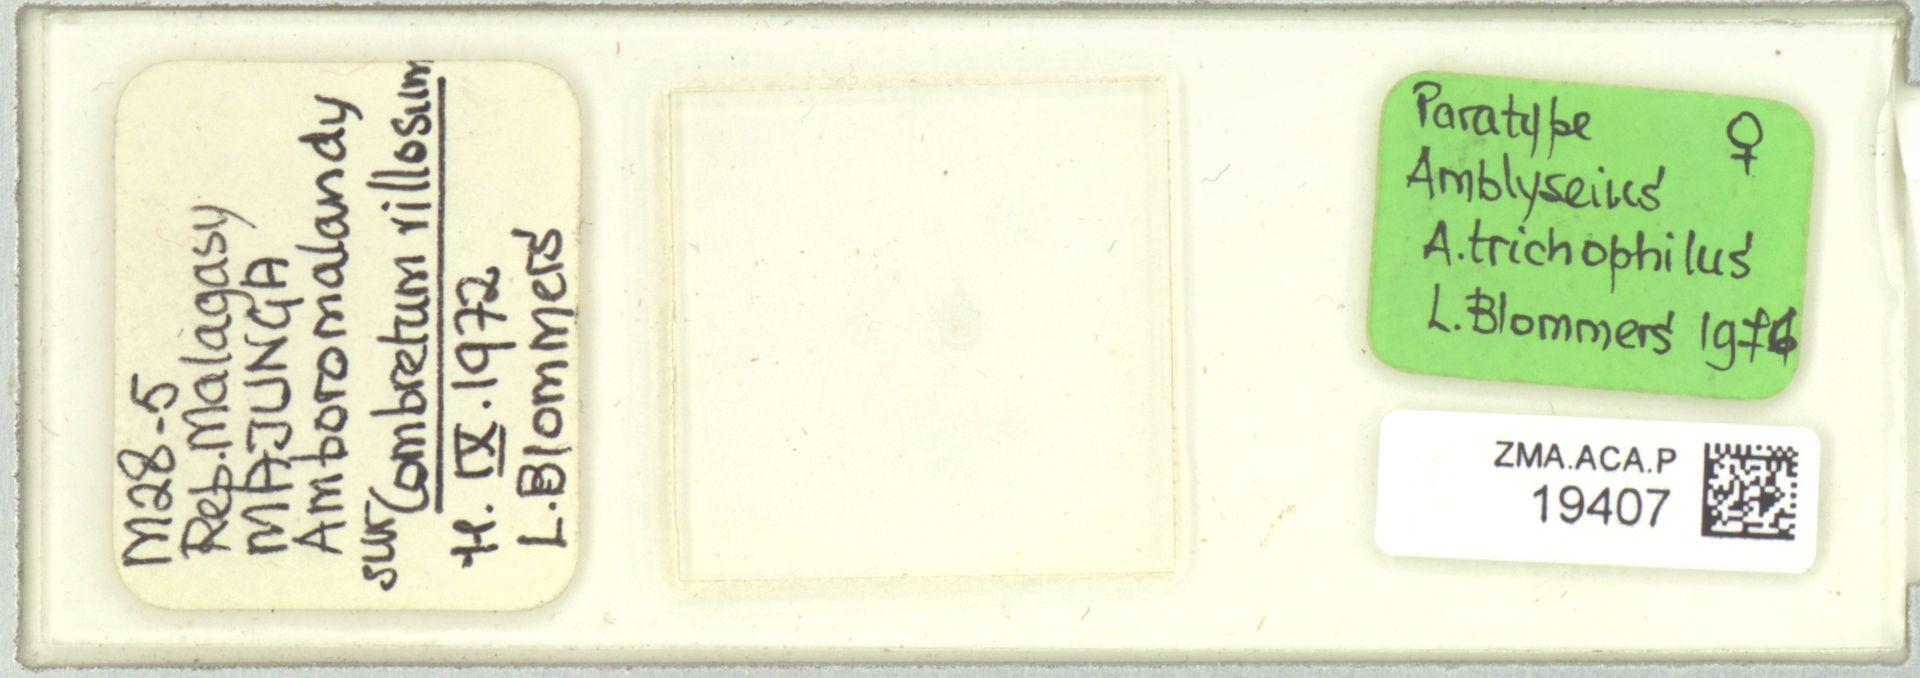 ZMA.ACA.P.19407 | Amblyseius (Amblyseius) trichophilus Blommers, 1976